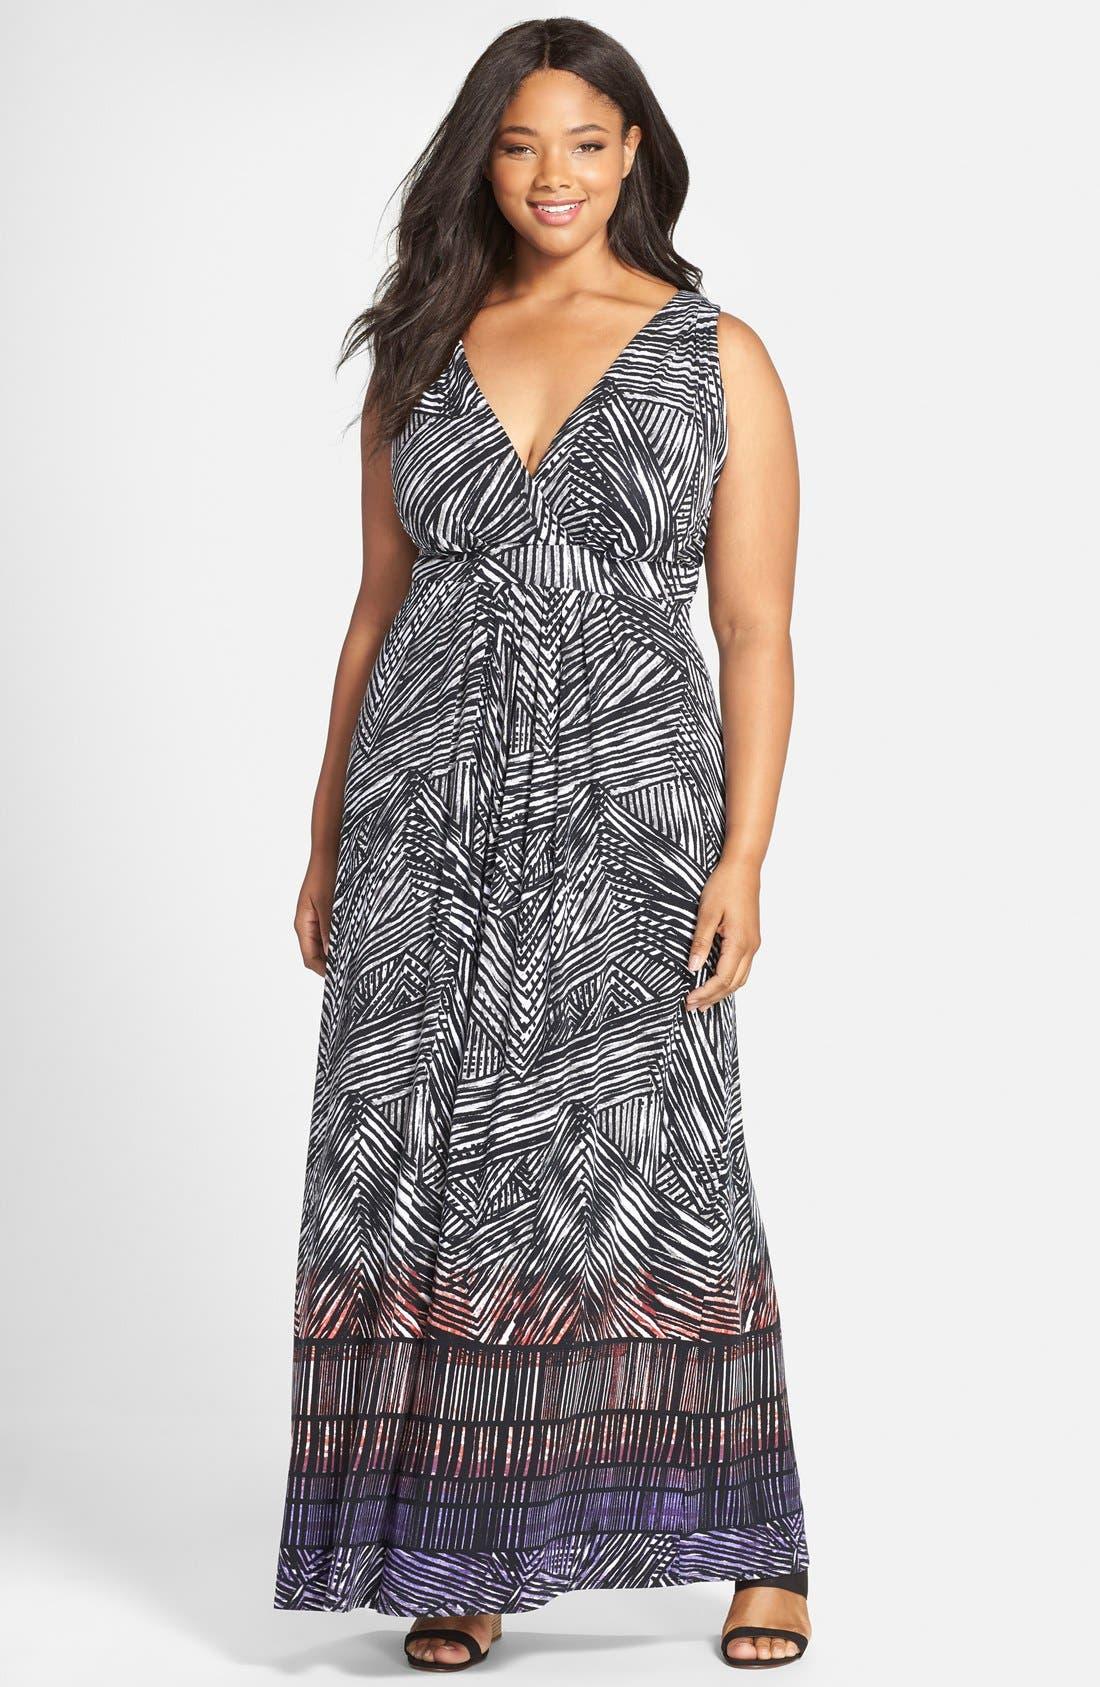 Cotton empire waist maxi dresses